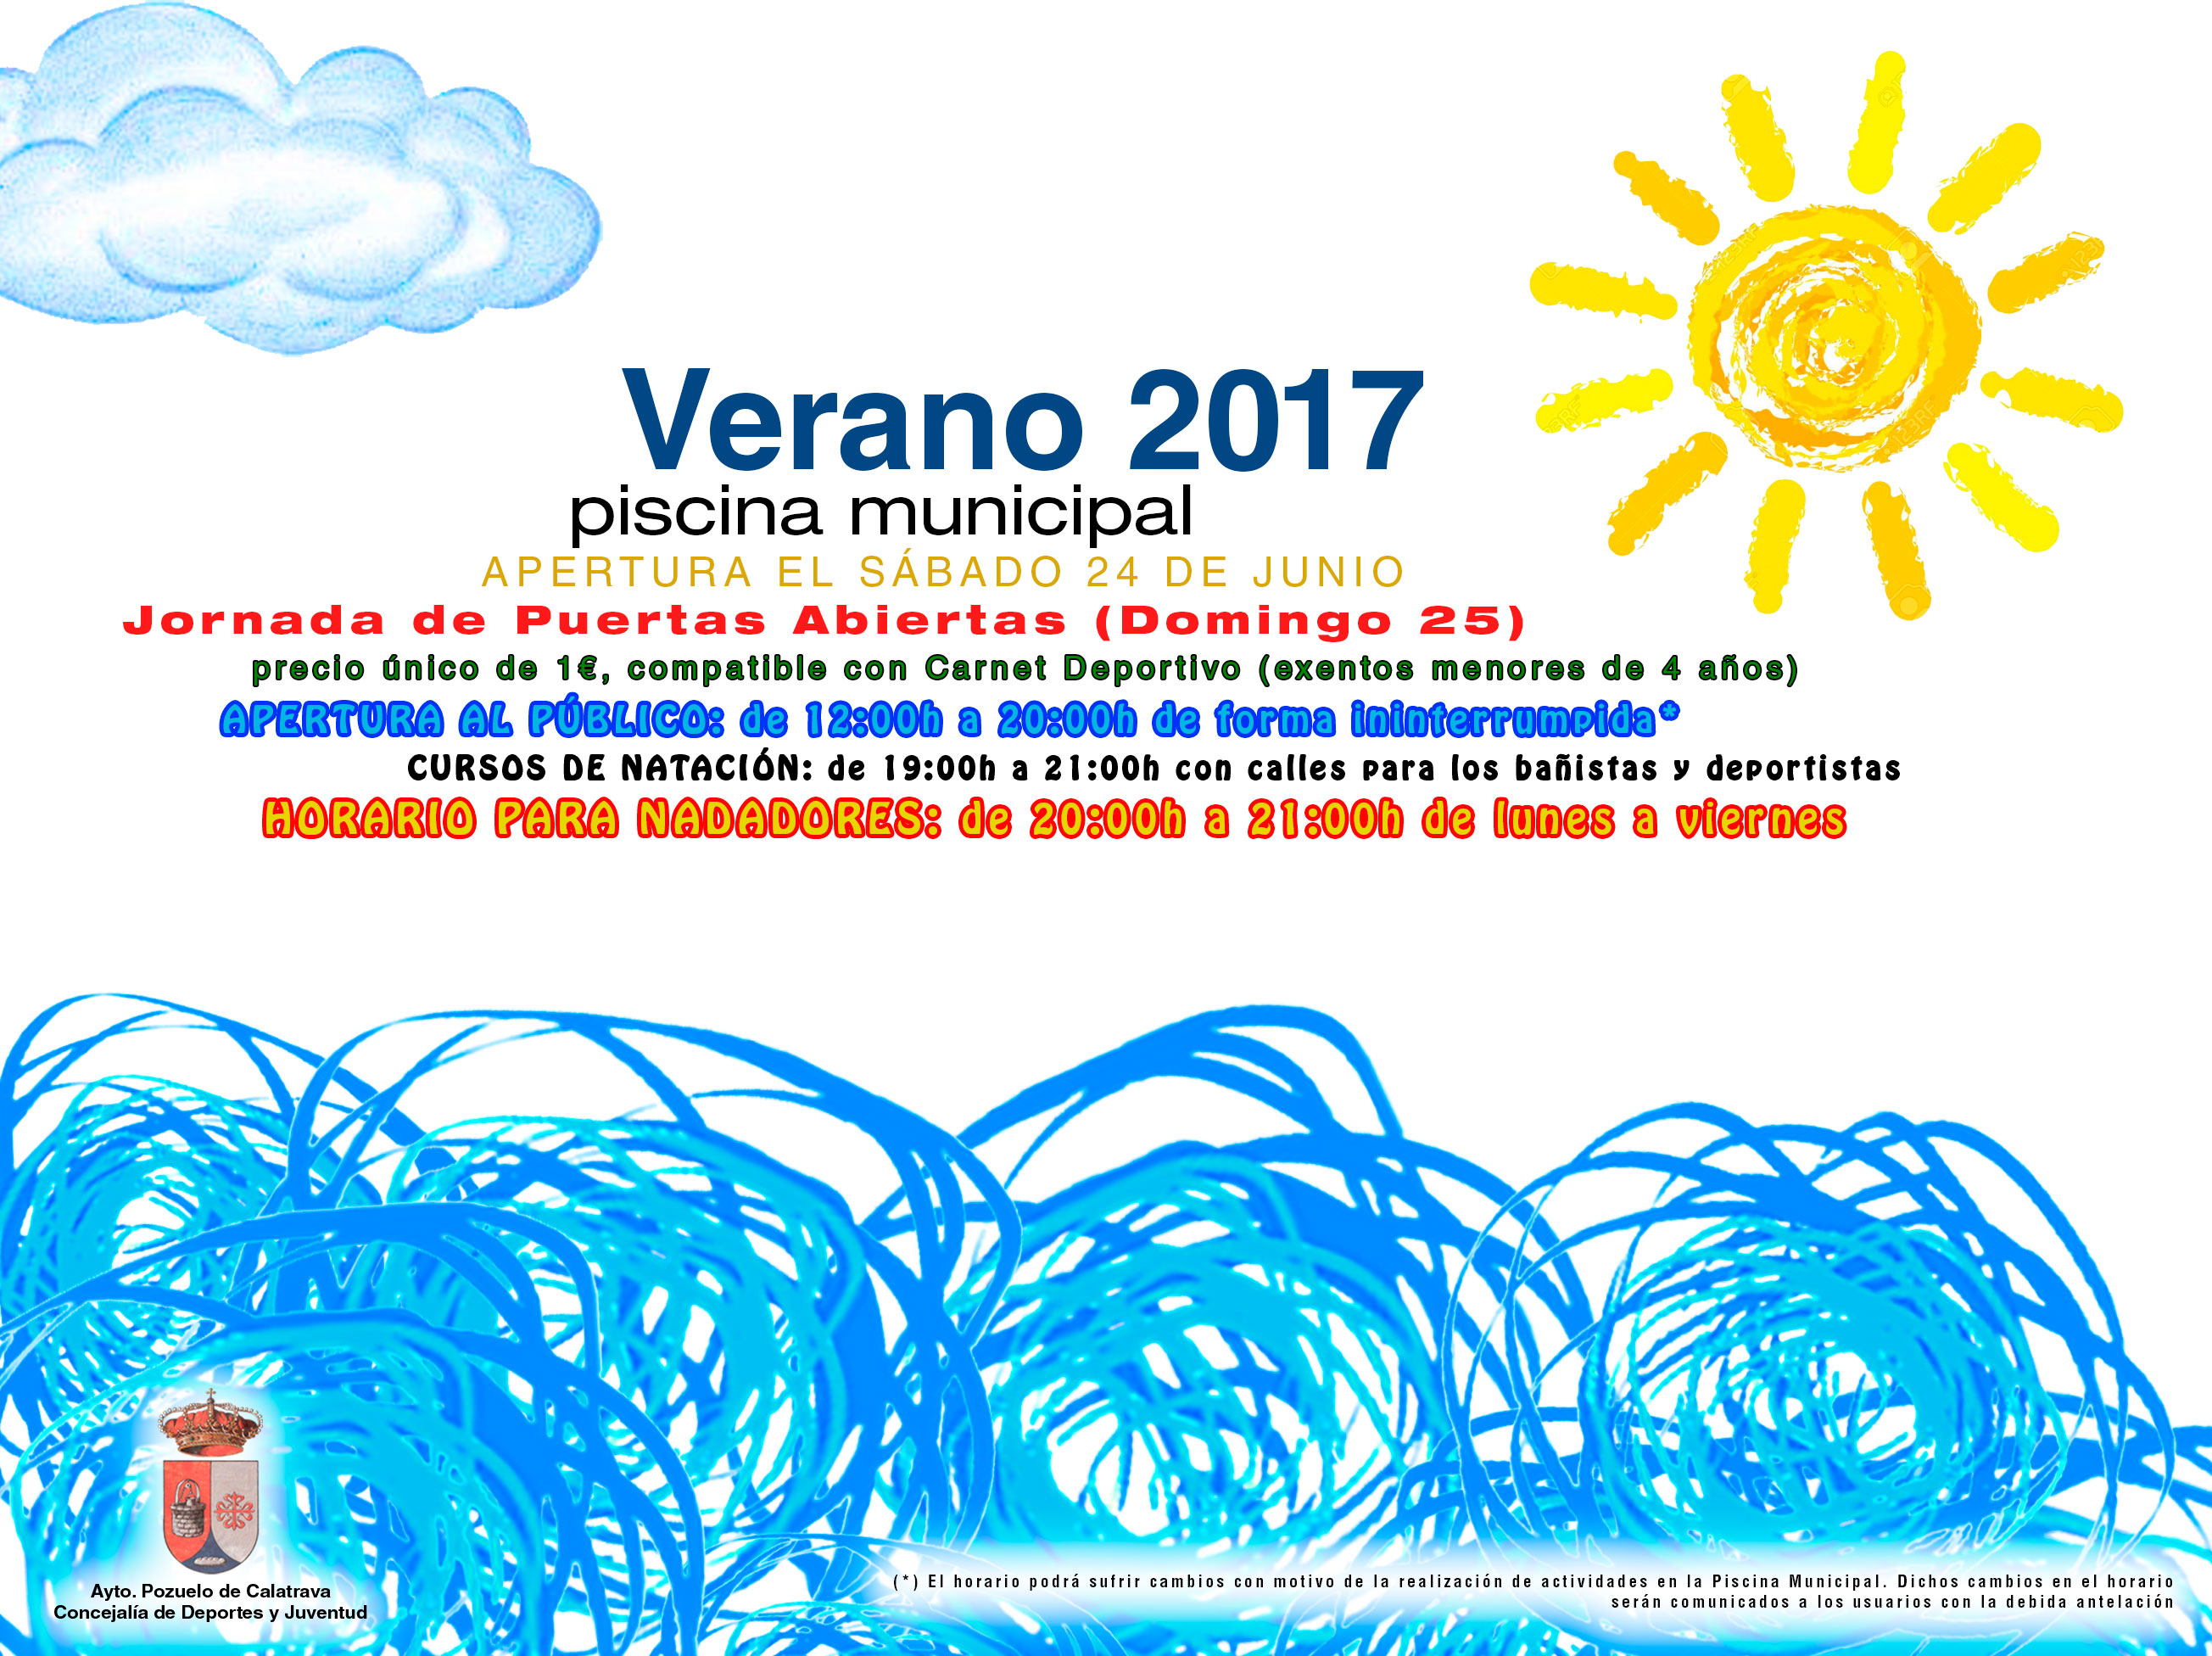 Nueva temporada piscina municipal 2017 pozuelo de calatrava for Piscina municipal pozuelo